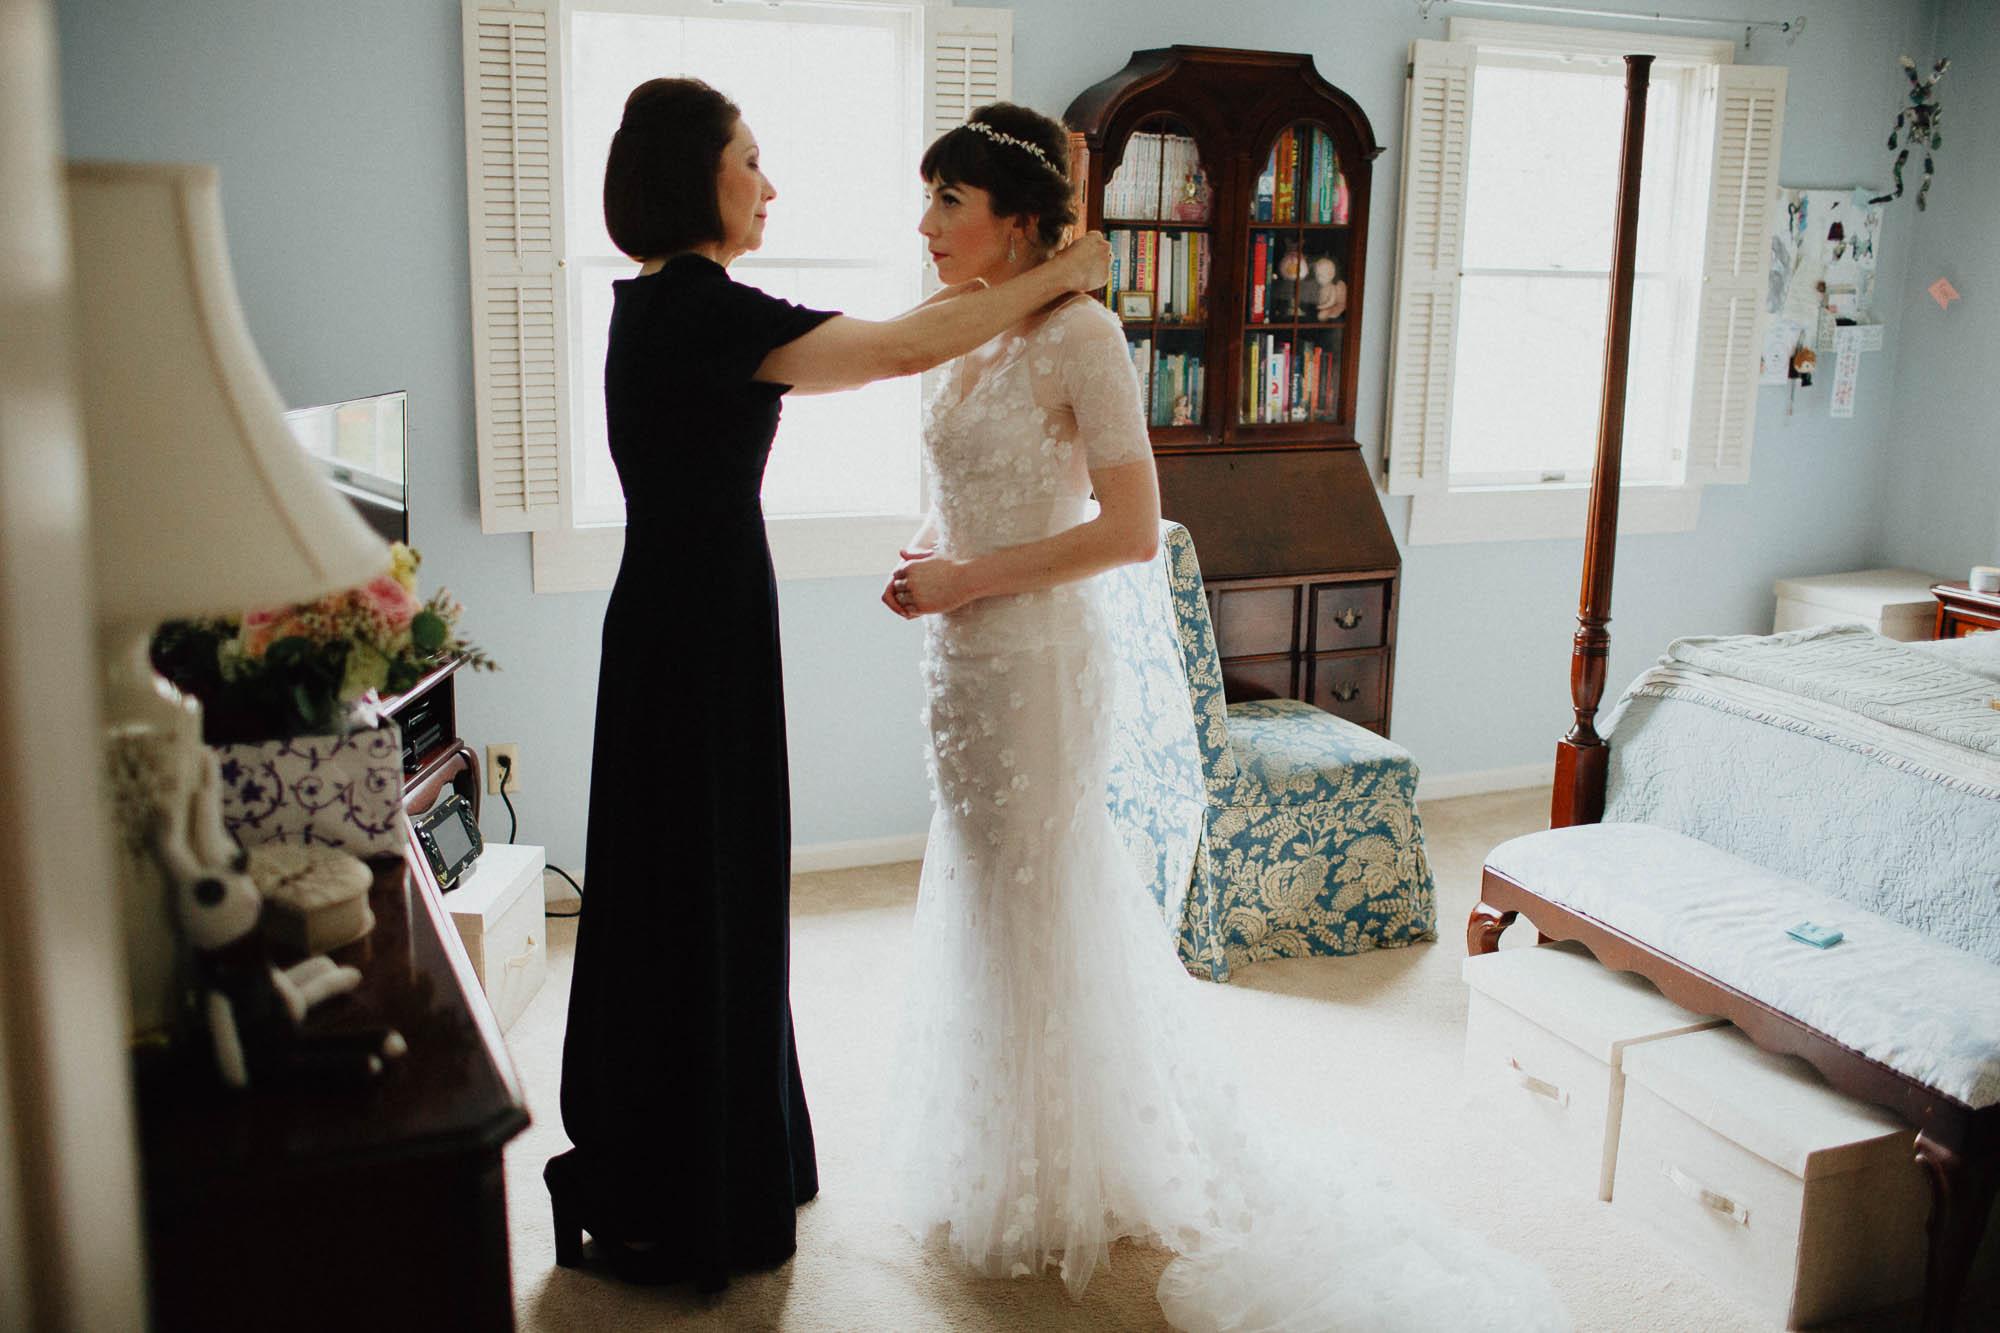 Claudia-Stephen-Peterloon-Wedding-Cincinnati-Ohio-012.jpg